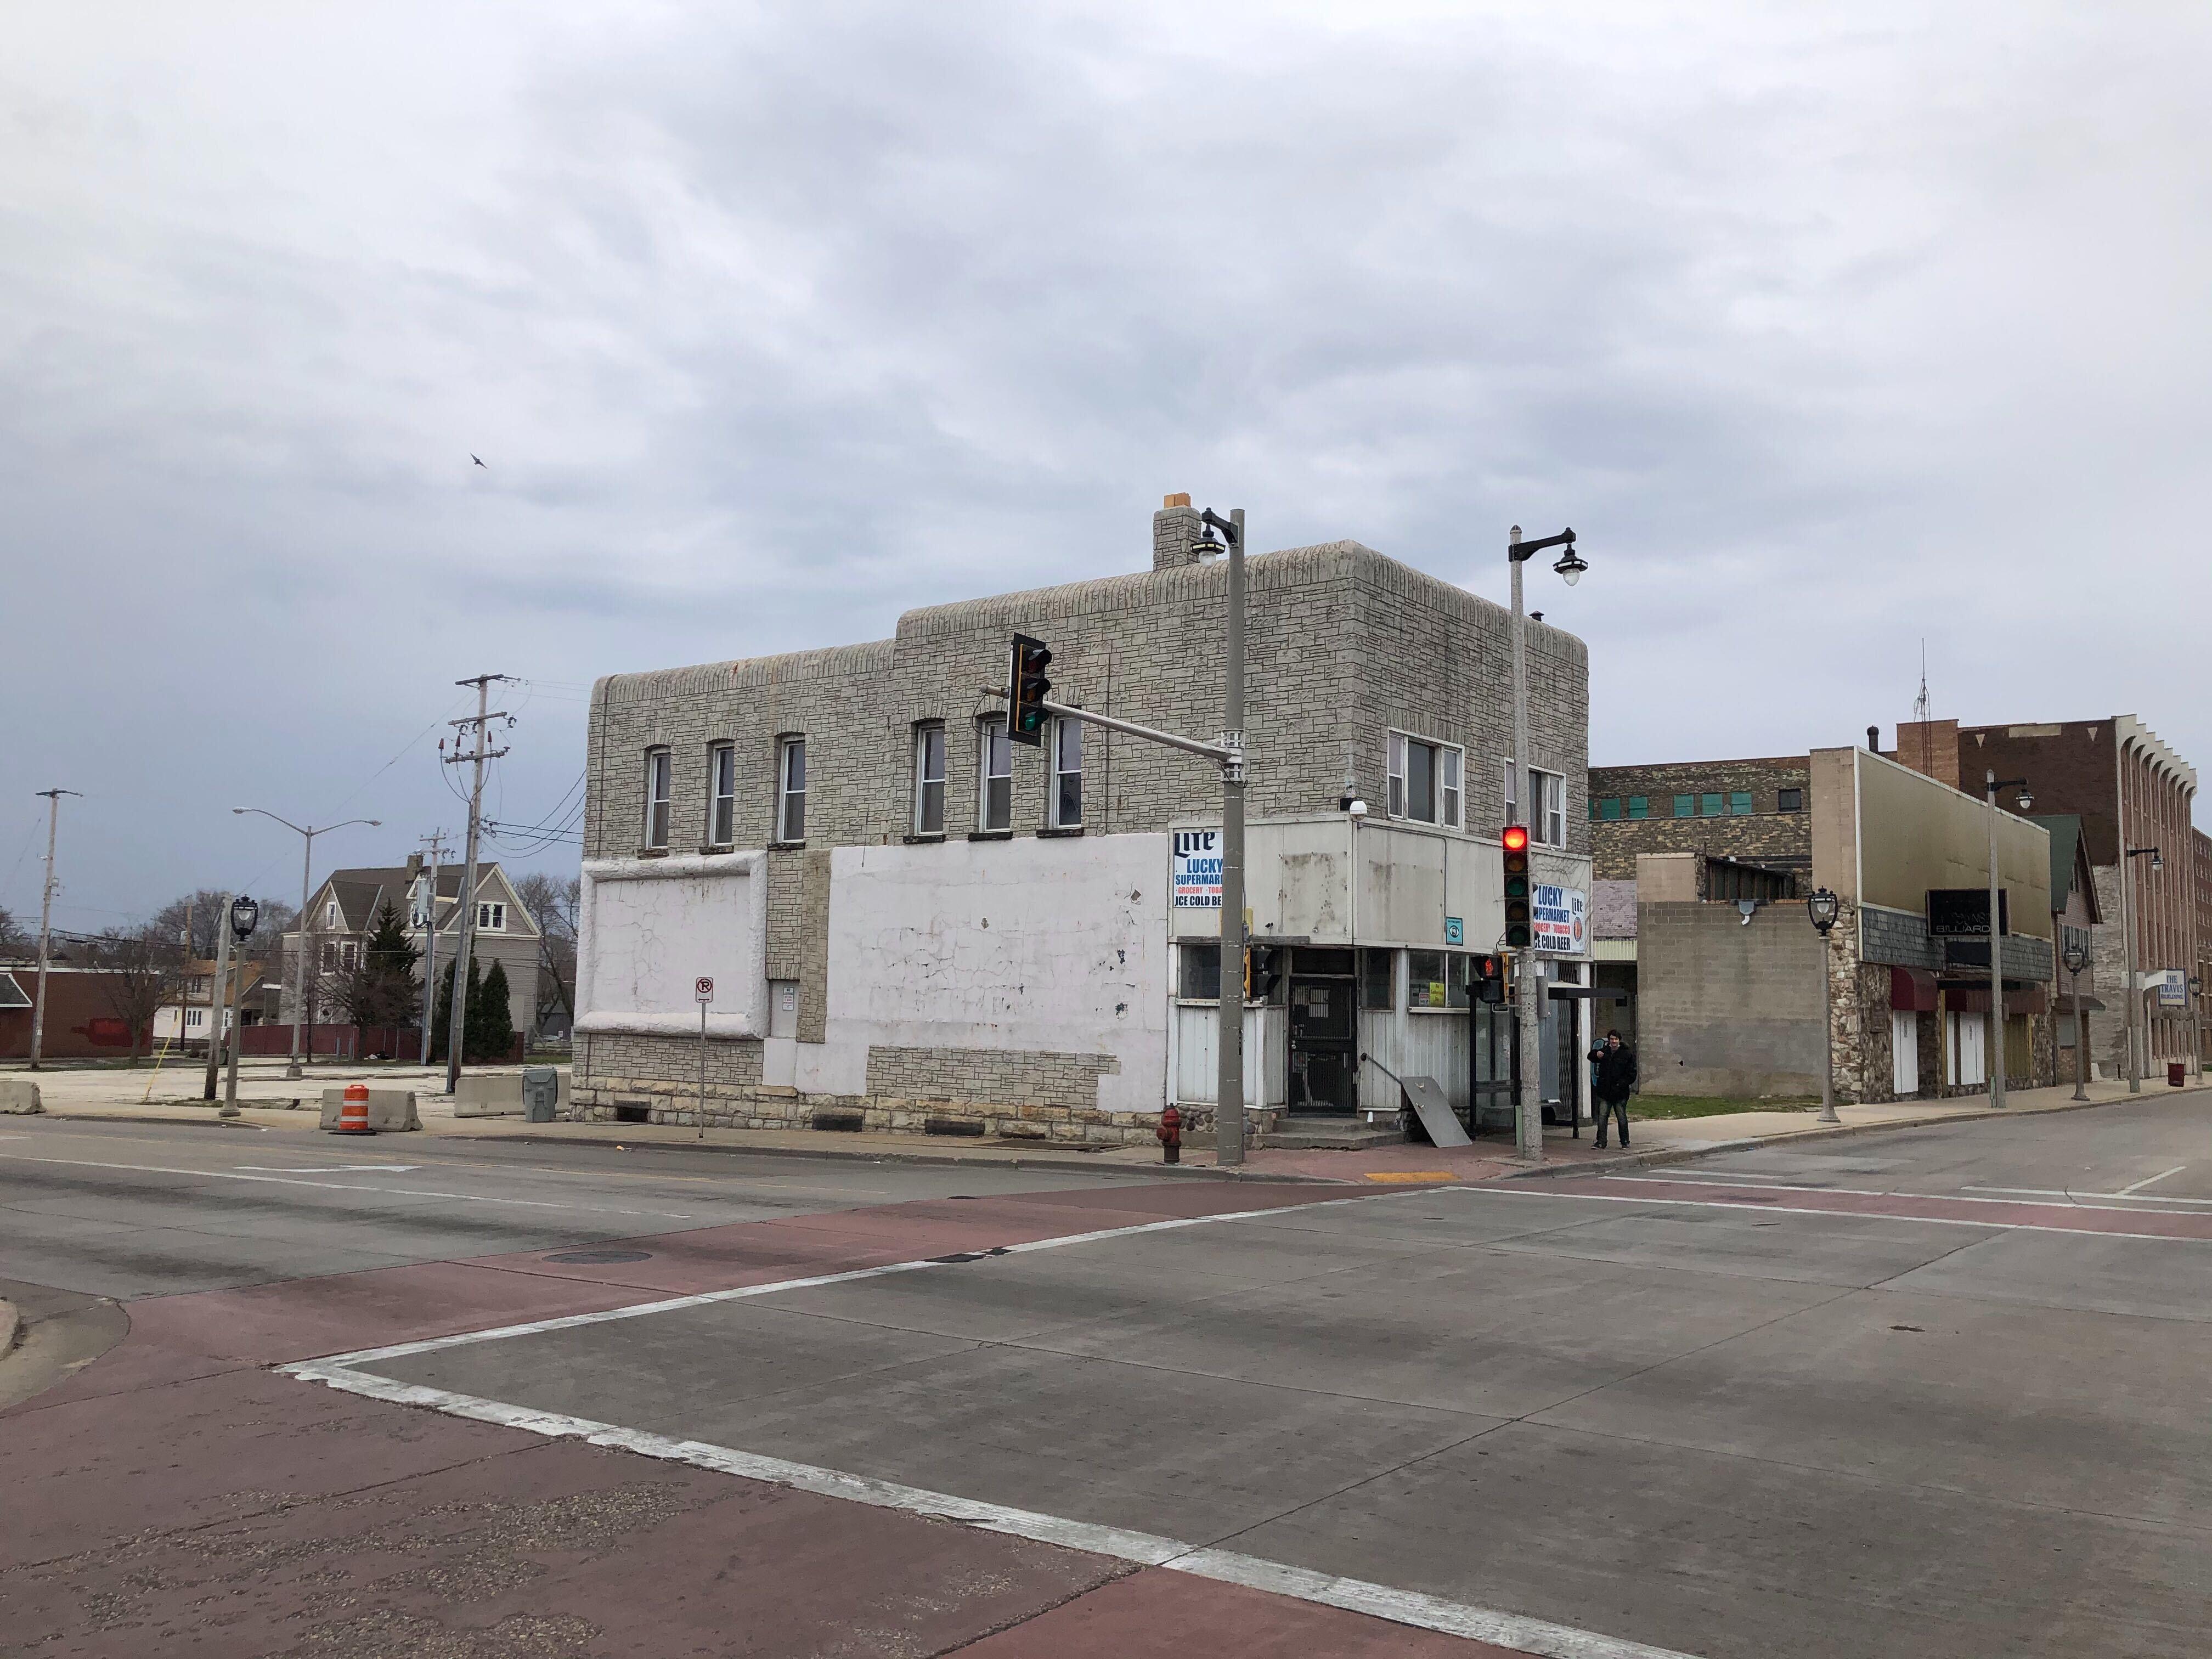 27th and Wisconsin development site. Photo by Jeramey Jannene.